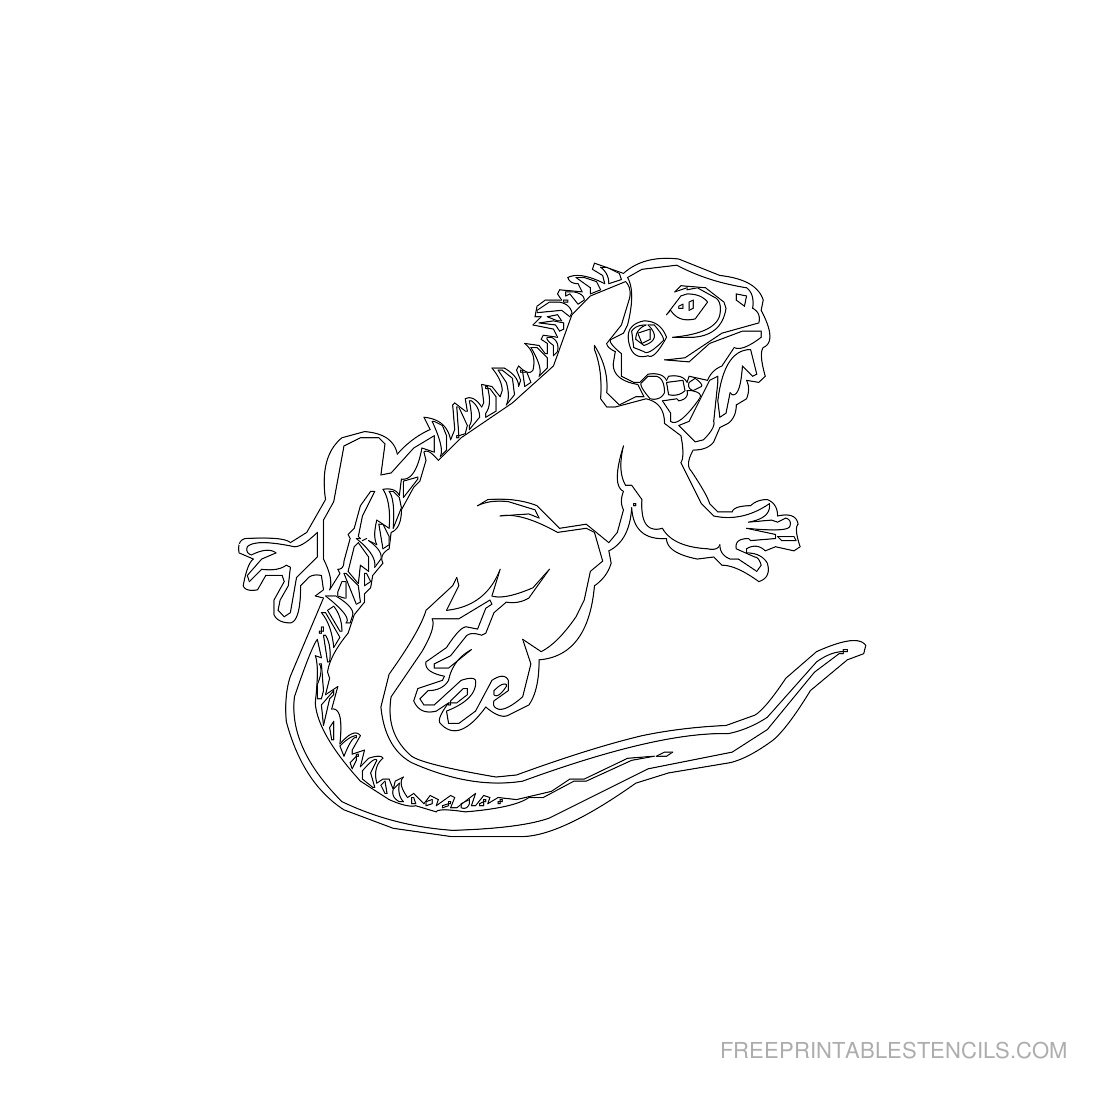 Free Printable Animal Stencil Iguana